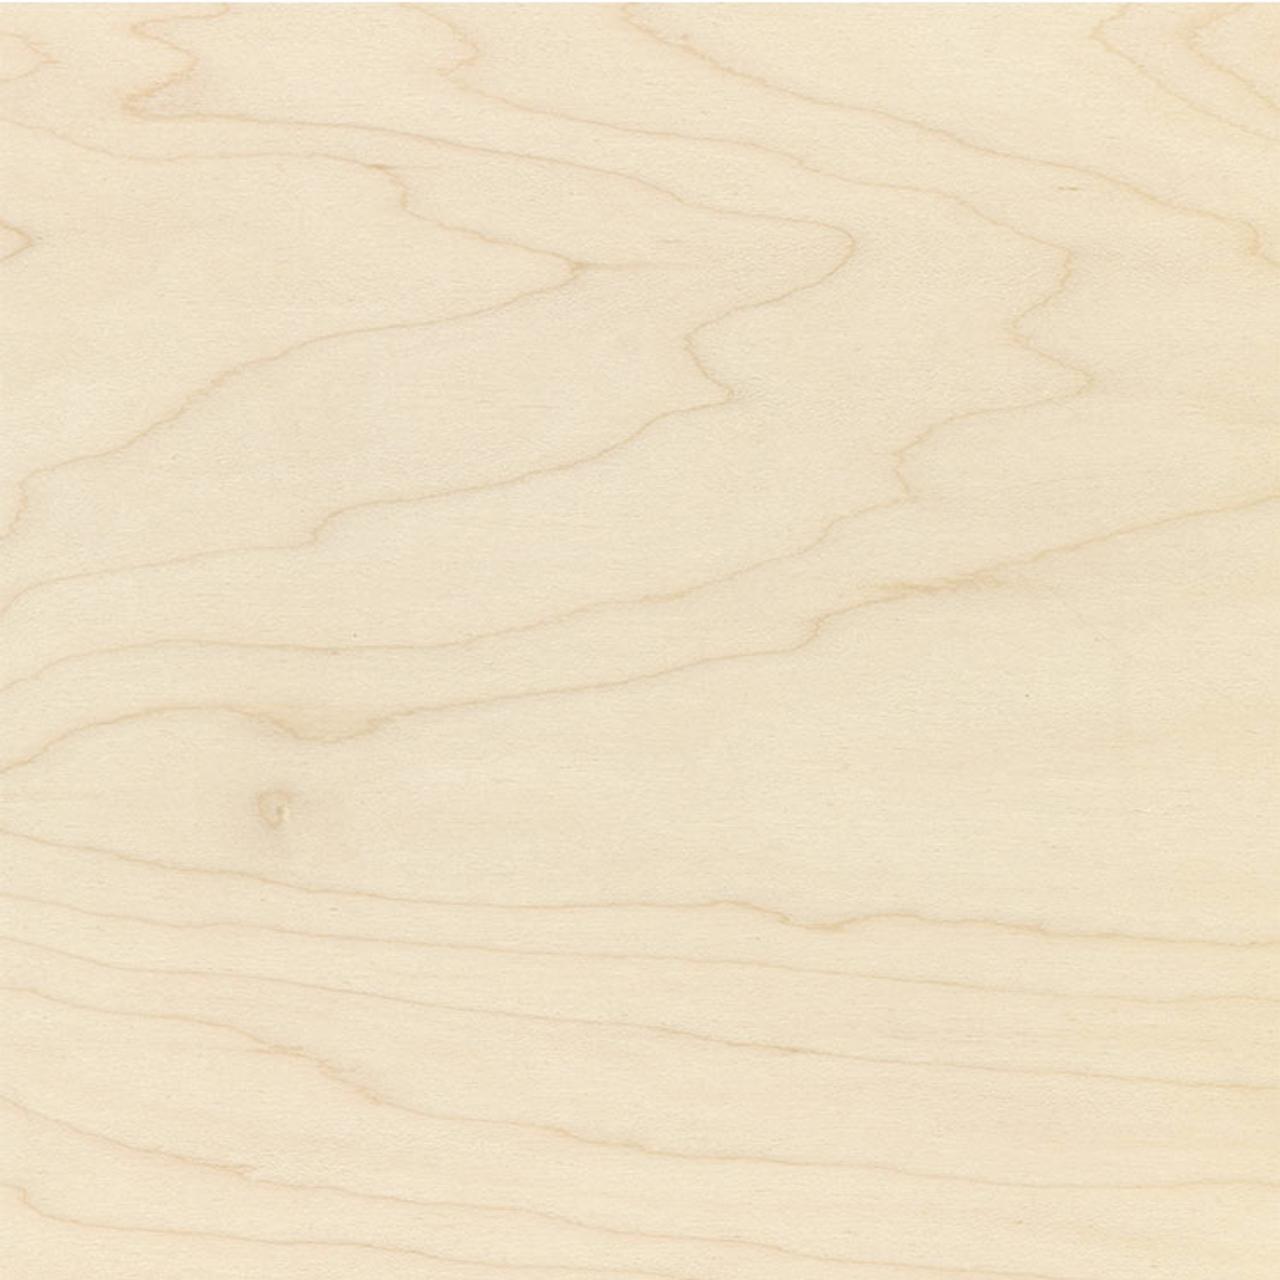 Garnica Artisan Maple White Shop Grade VC 4x8